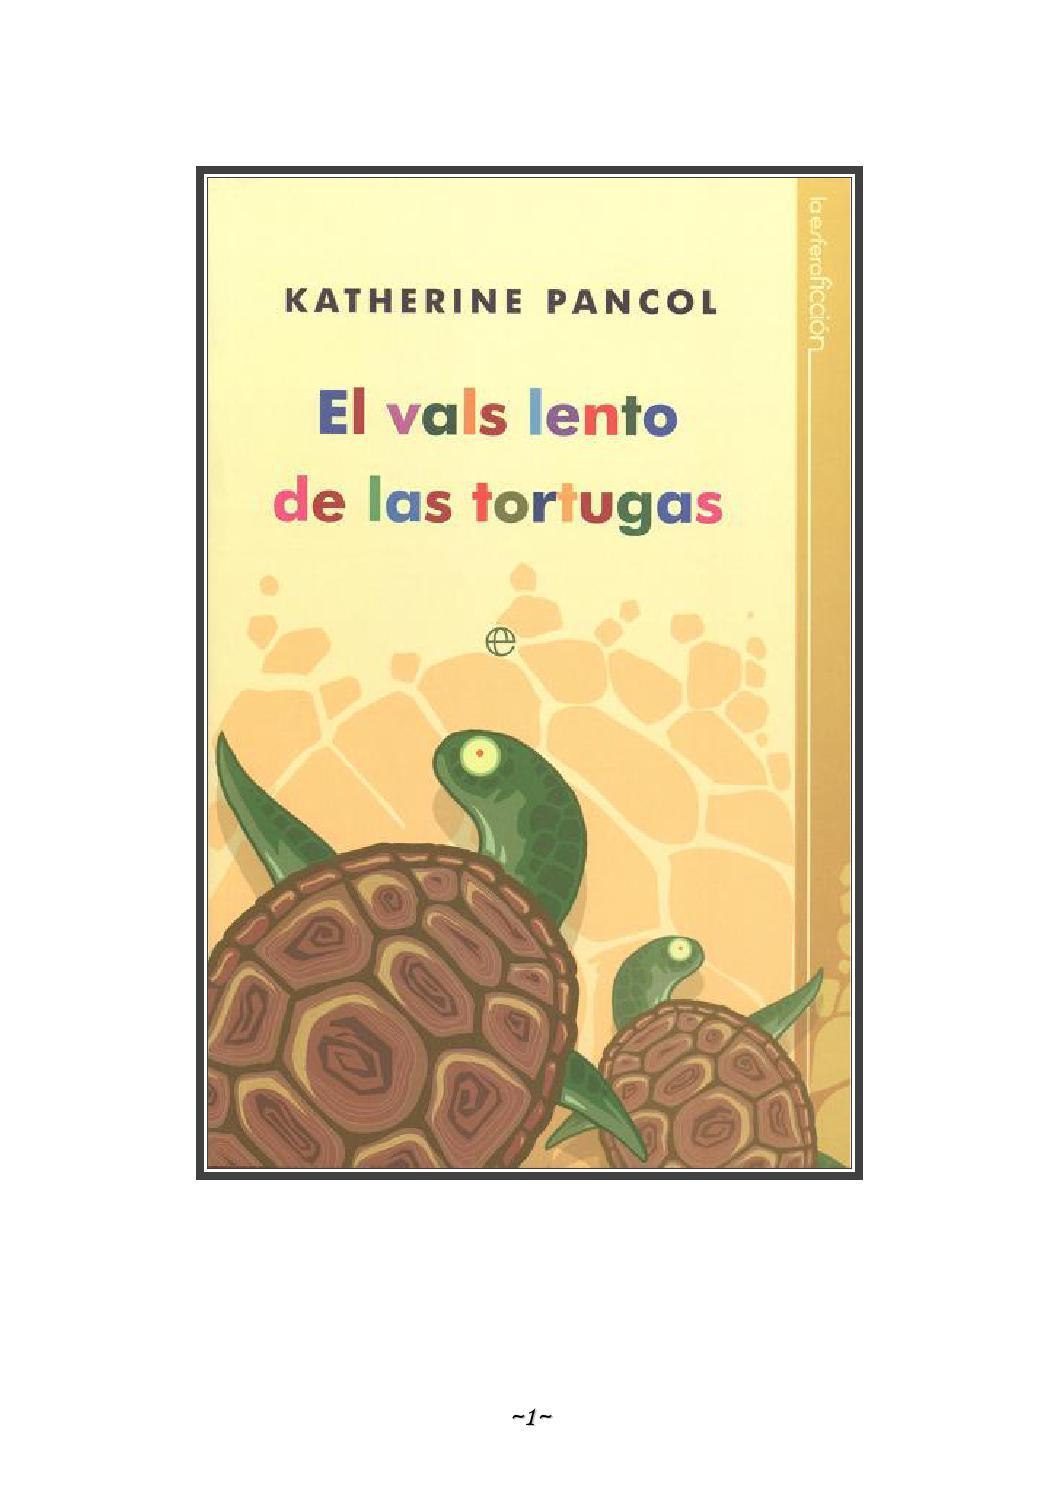 El vals lento de las tortugas katherine pancol by Cristiane Pereira da  Silva - issuu f8d1c6bac058